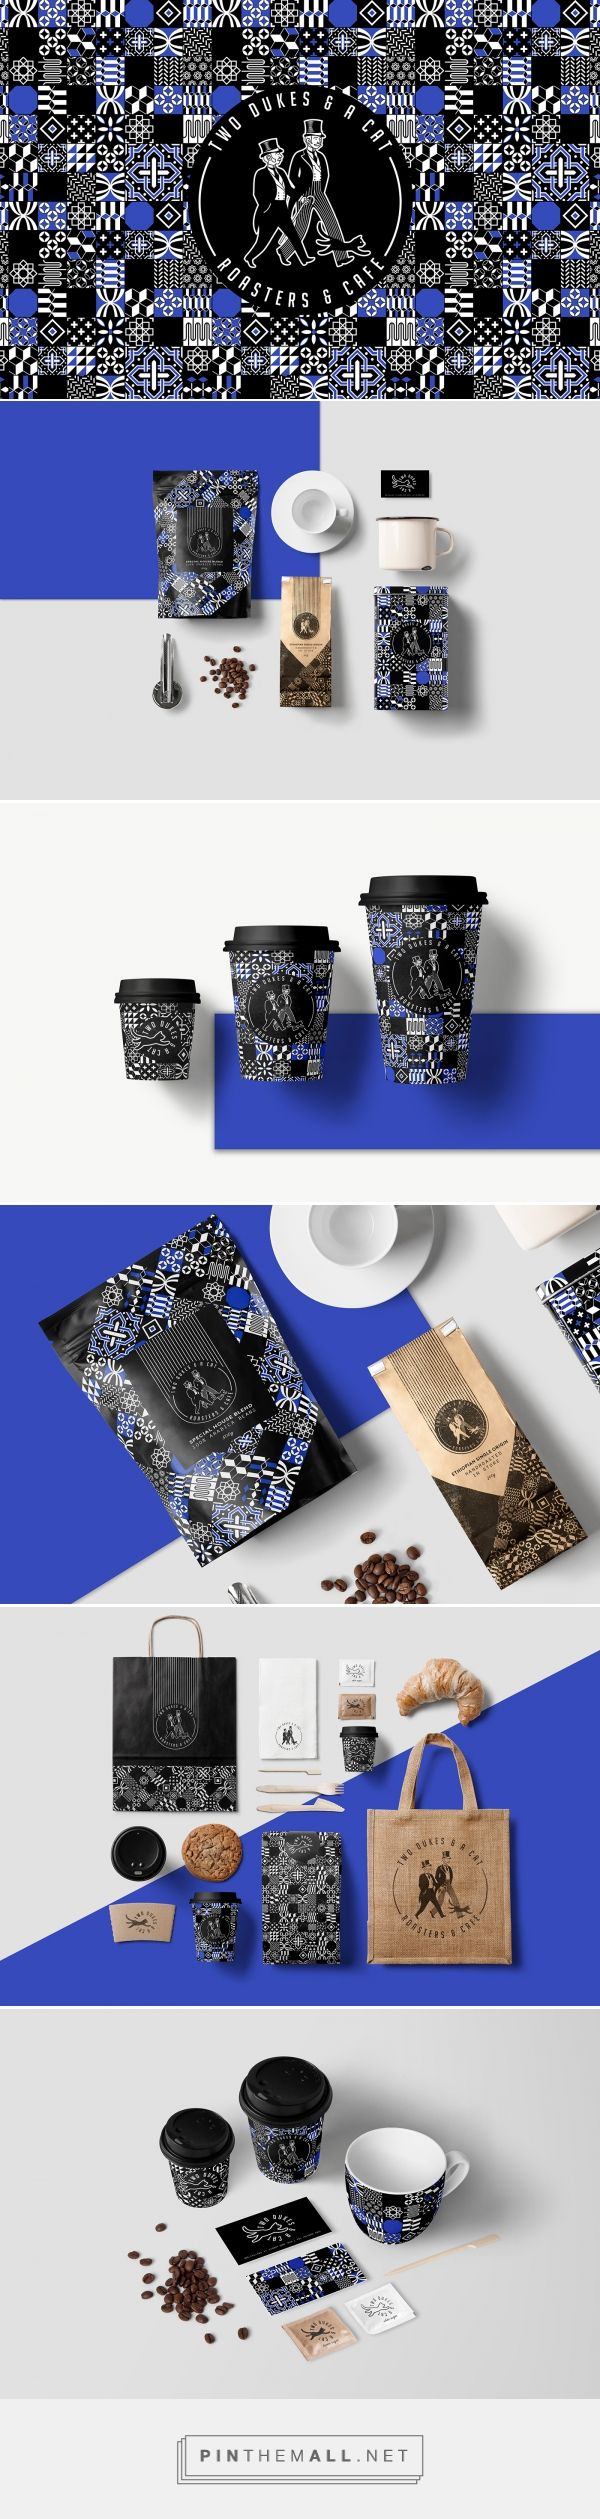 Two Dukes & A Cat on Behance  | Fivestar Branding – Design and Branding Agency & Inspiration Gallery